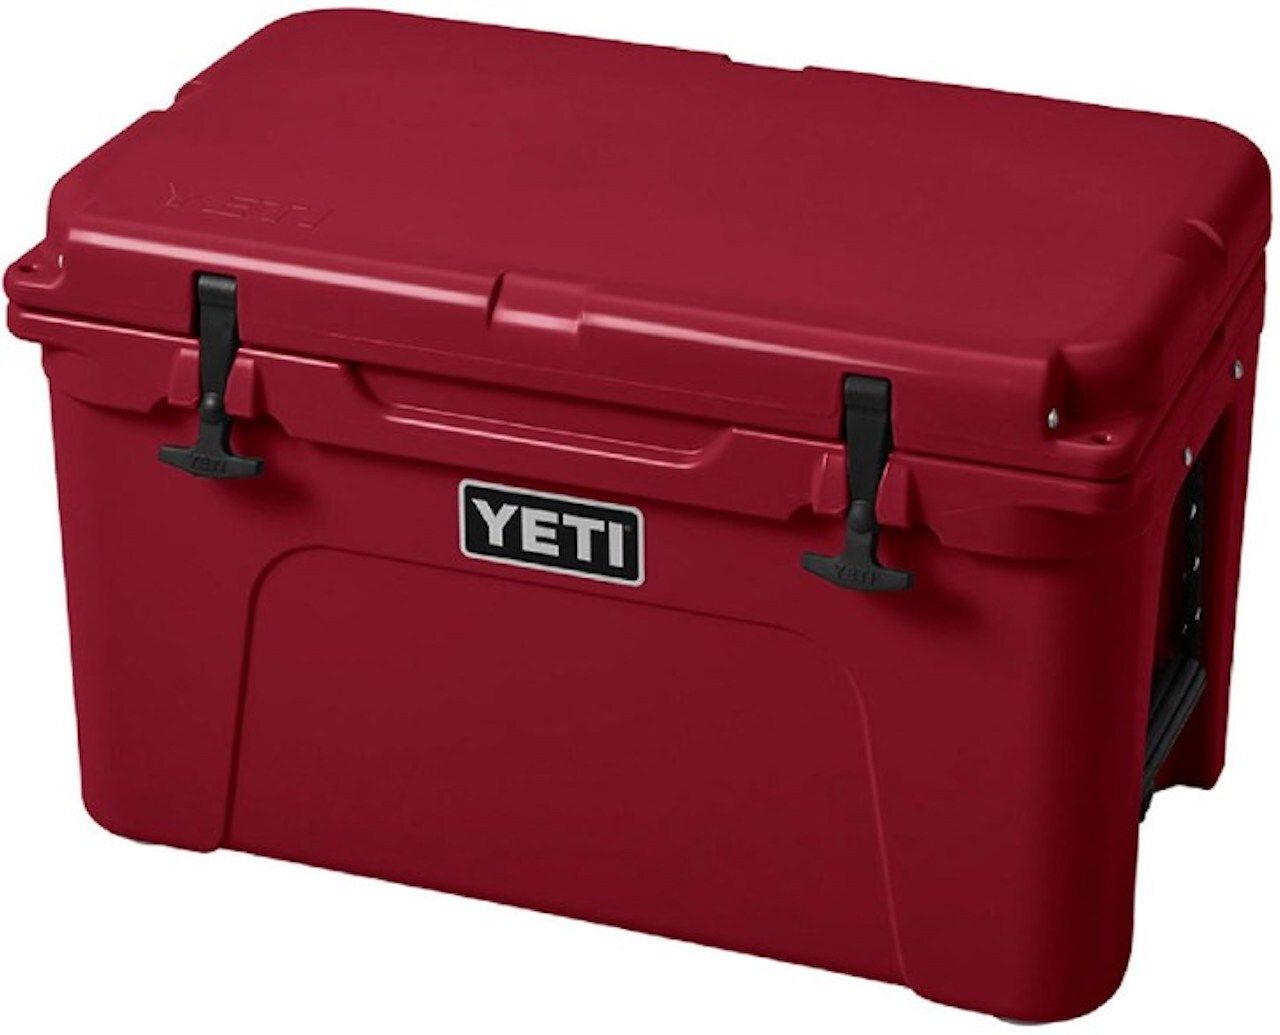 rafting-trip-matador-gear-guide-YETI-Tundra-Cooler